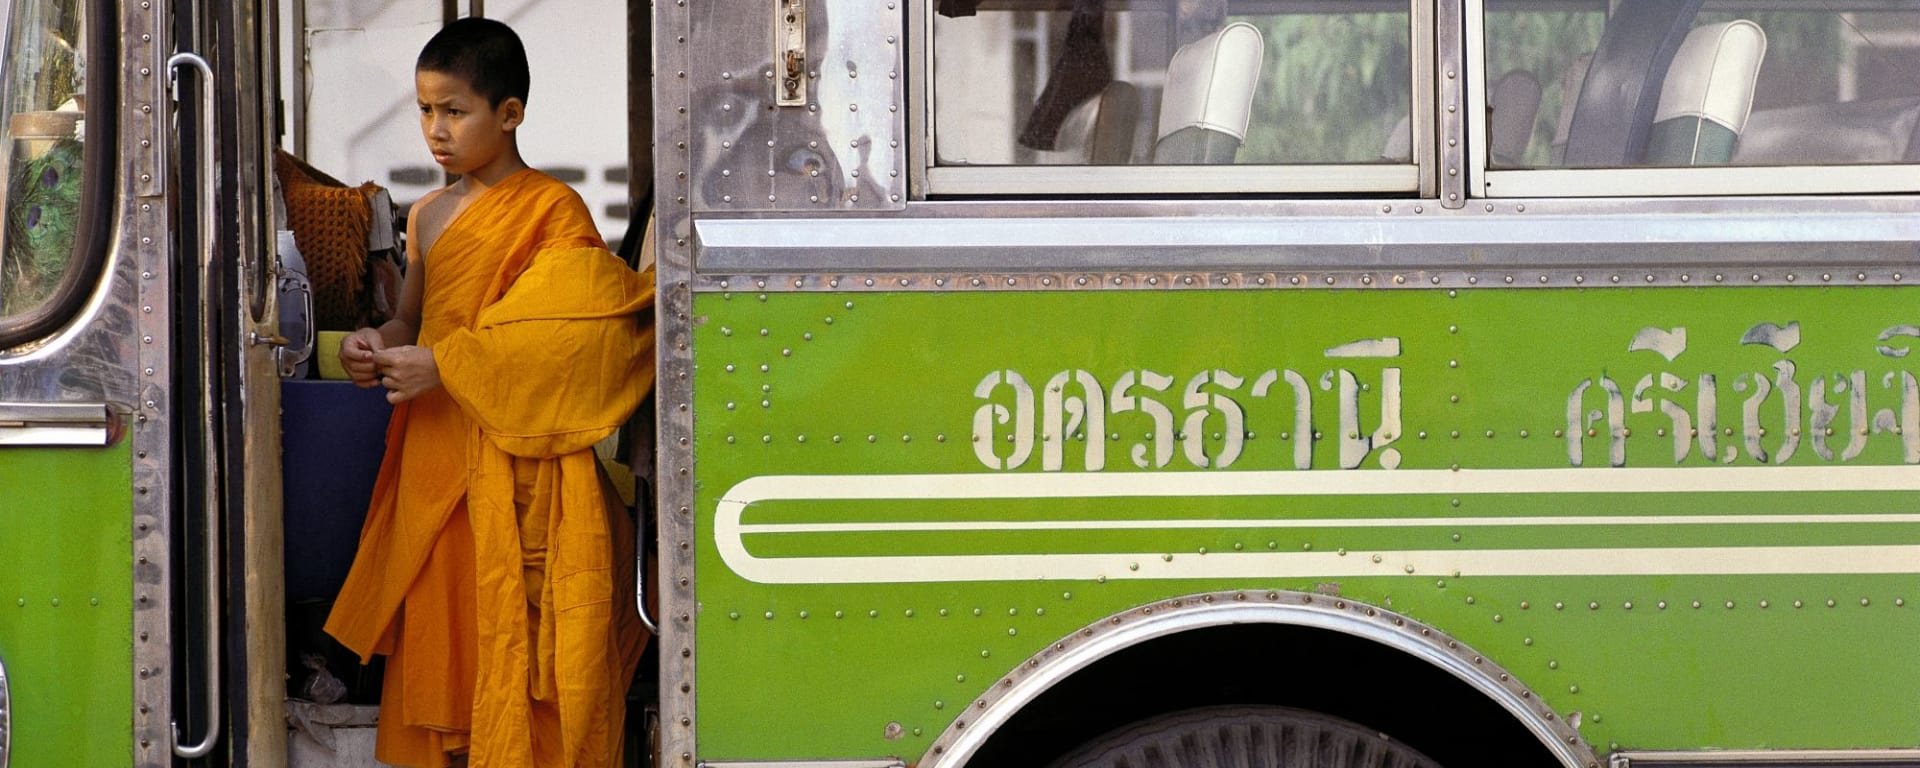 Bangkok à son gré / Journée entière ville et banlieue de Bangkok: Bangkok young monk in a bus